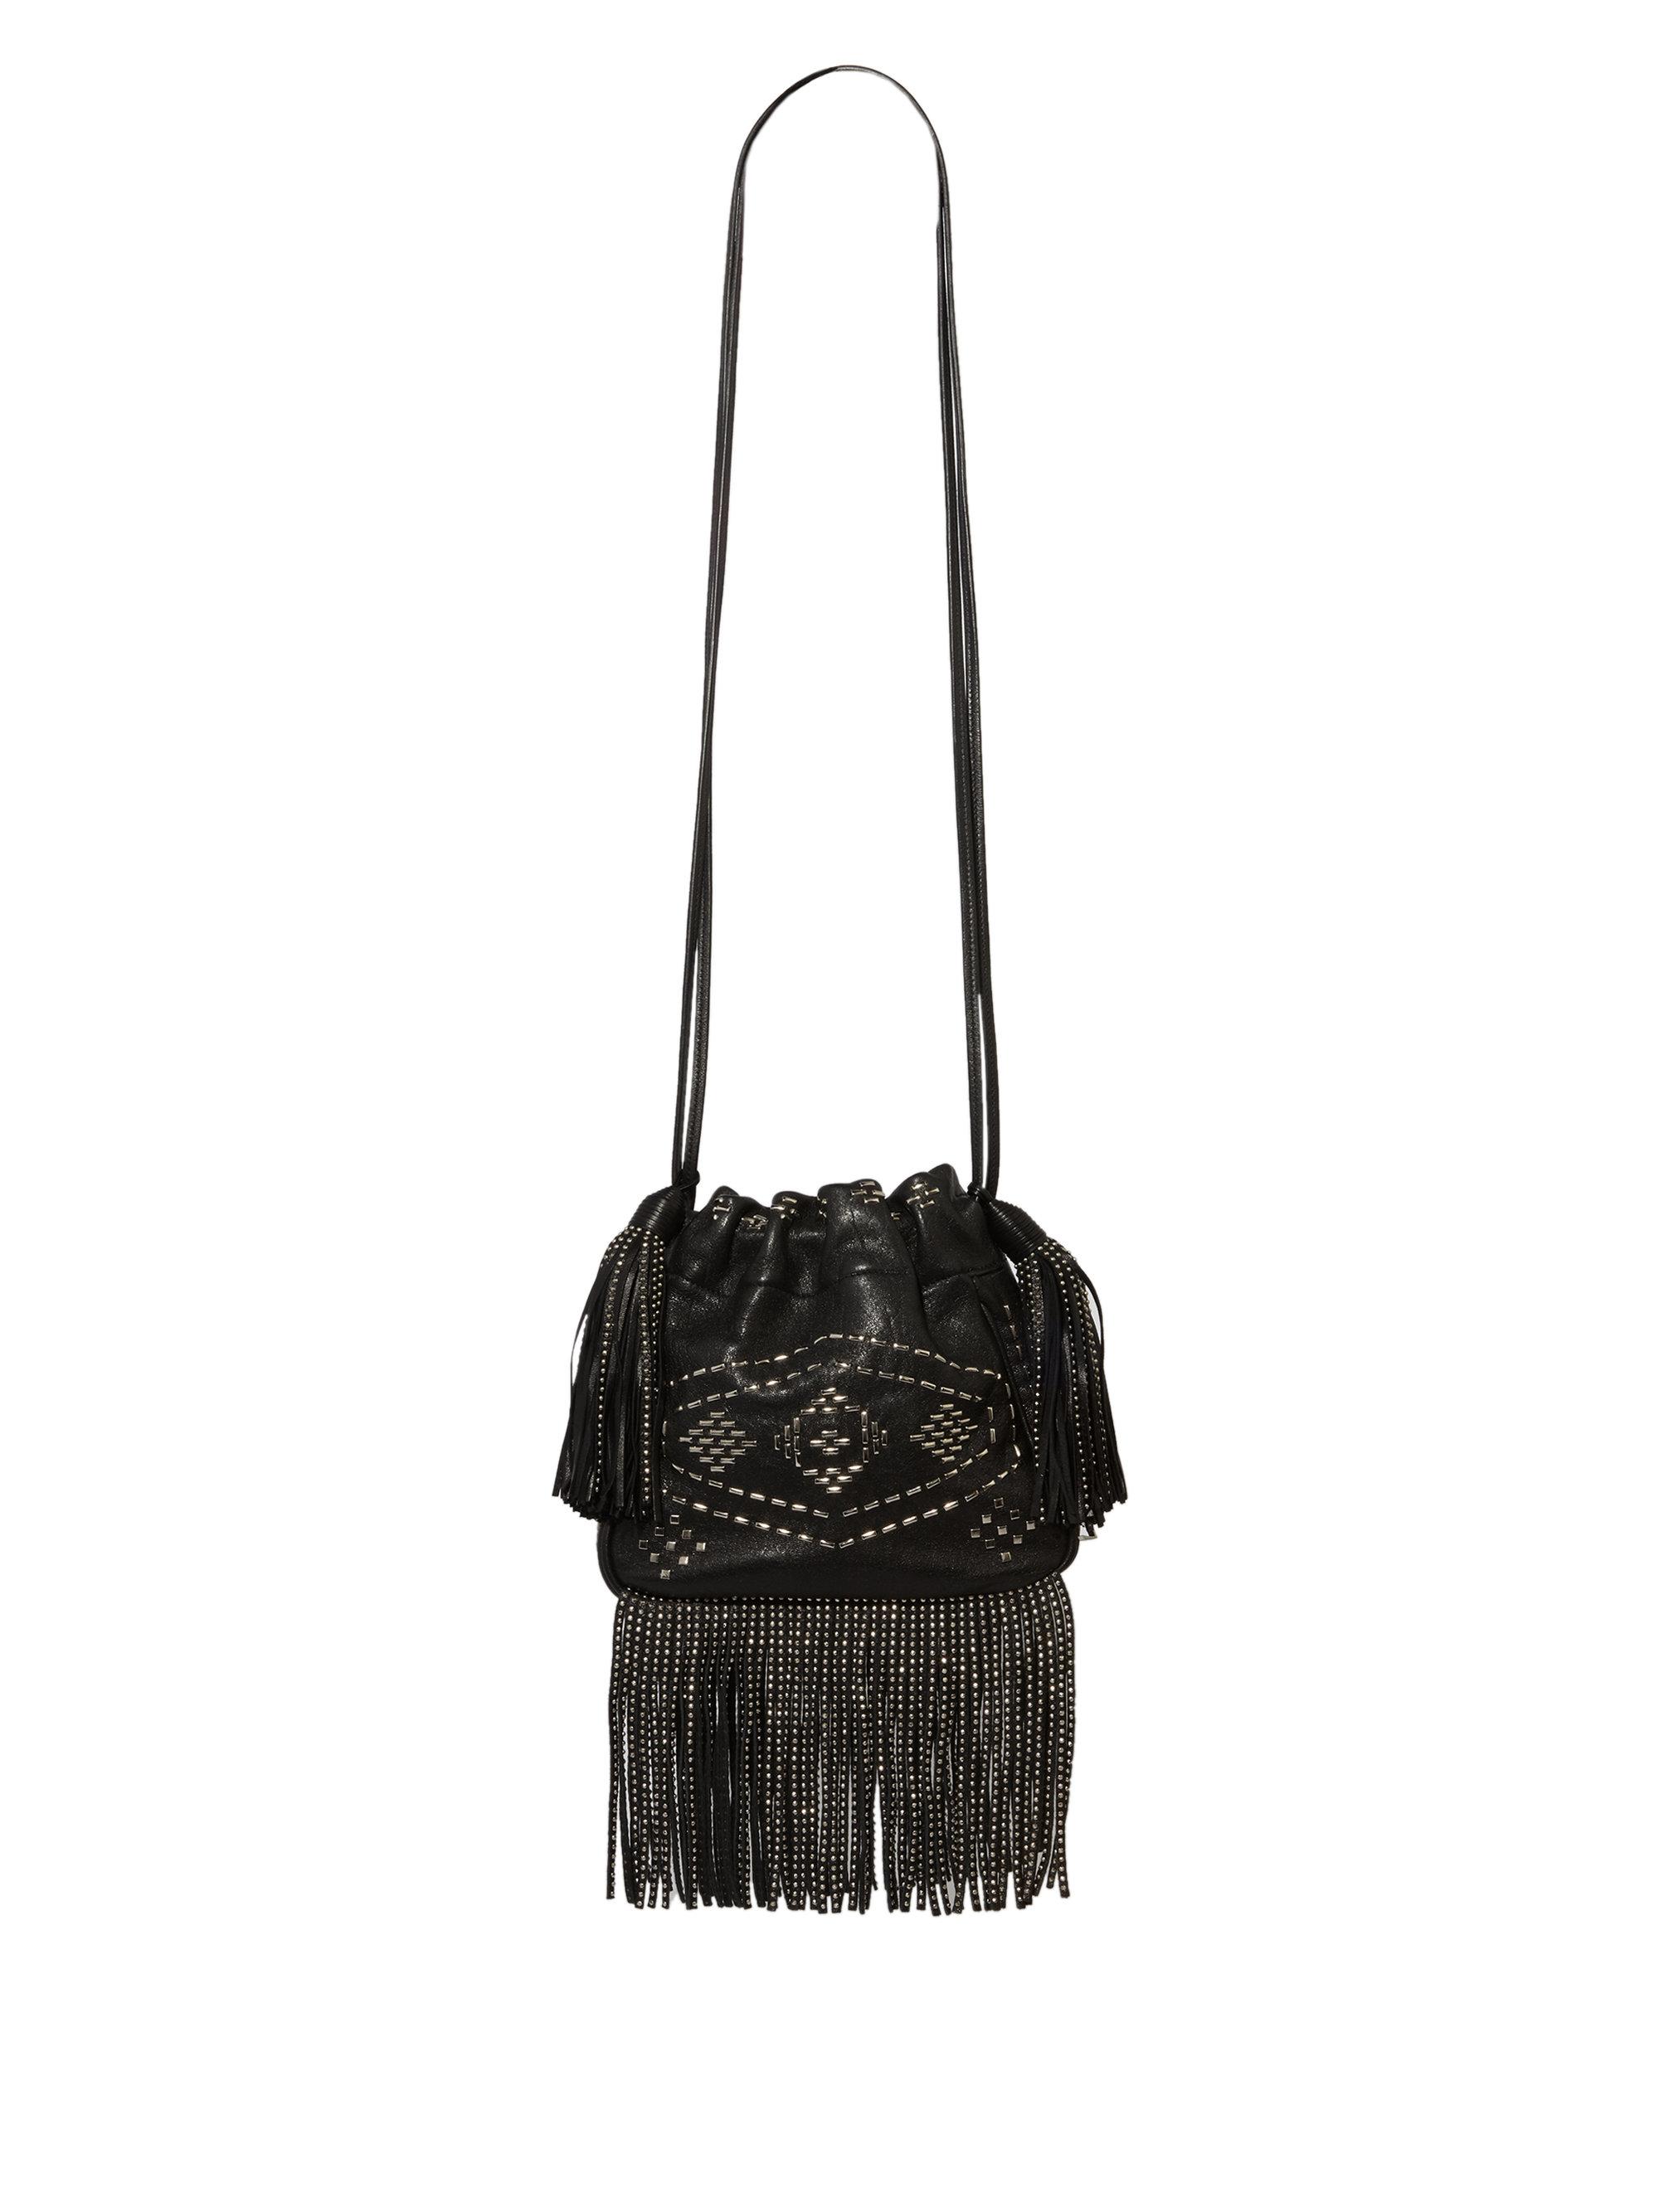 buy ysl clutch online - monogram saint laurent blogger bag in black leather